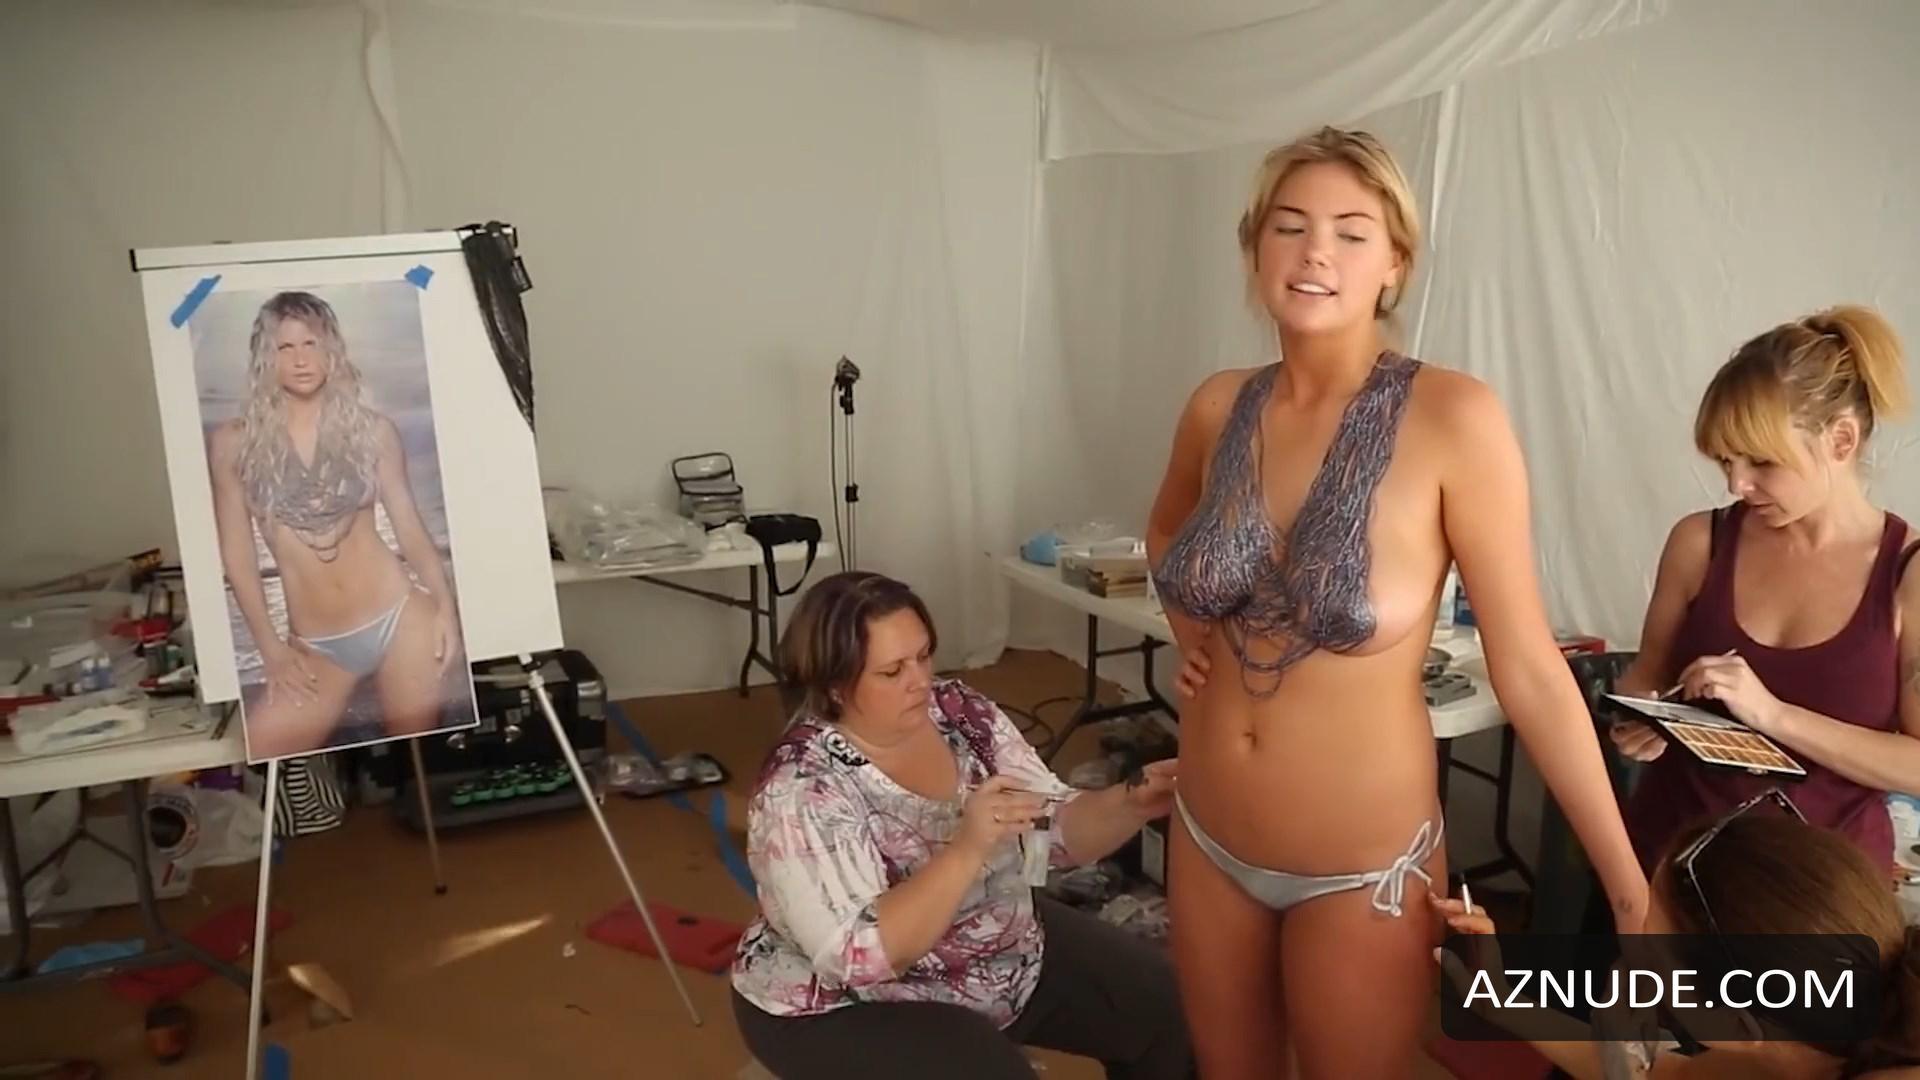 Upton paint swimsuit body kate